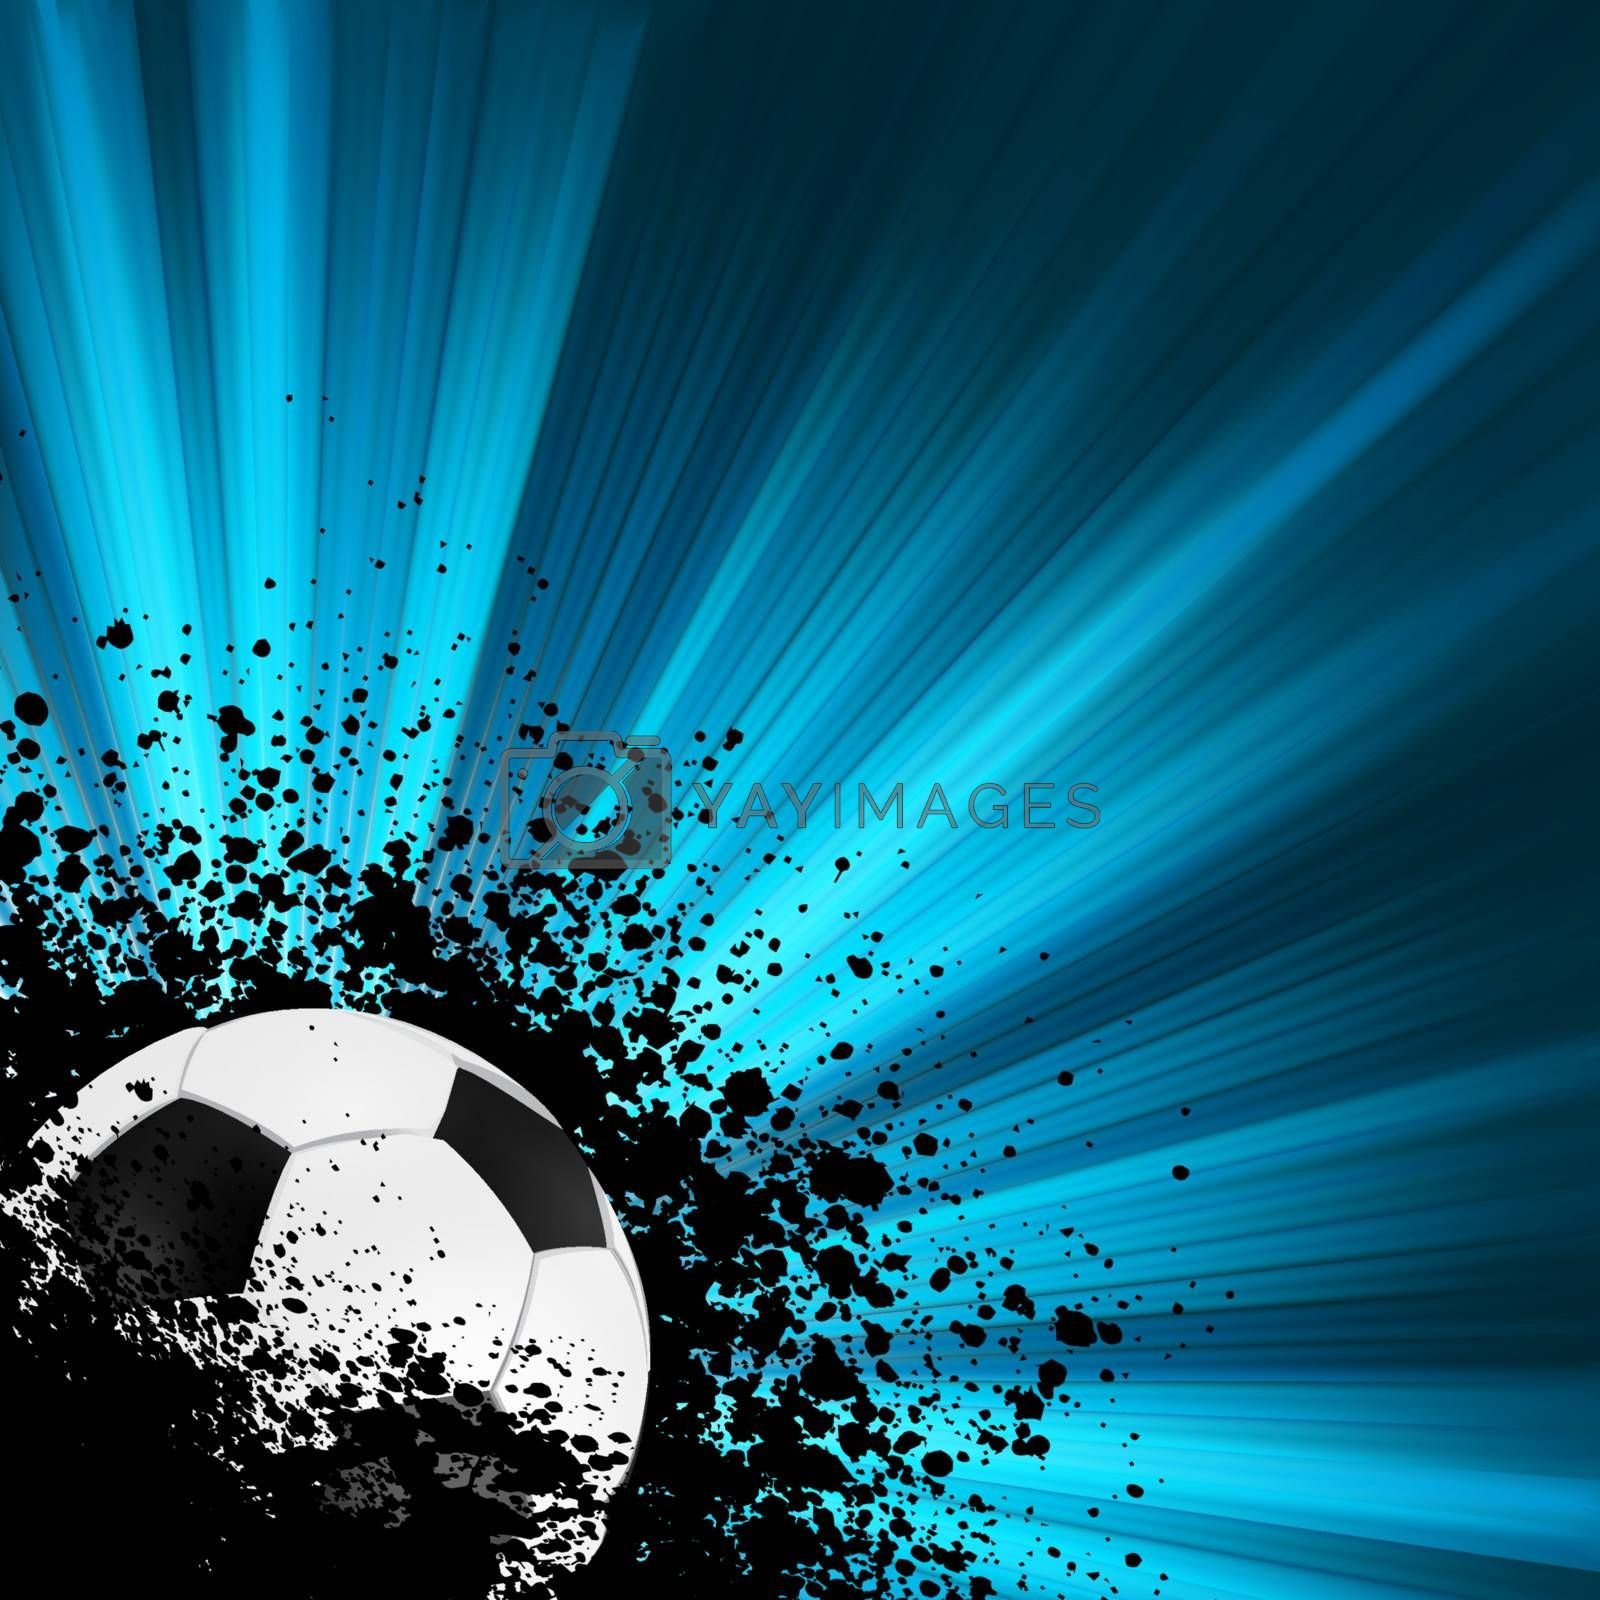 Grunge burst football poster. EPS 8 vector file included